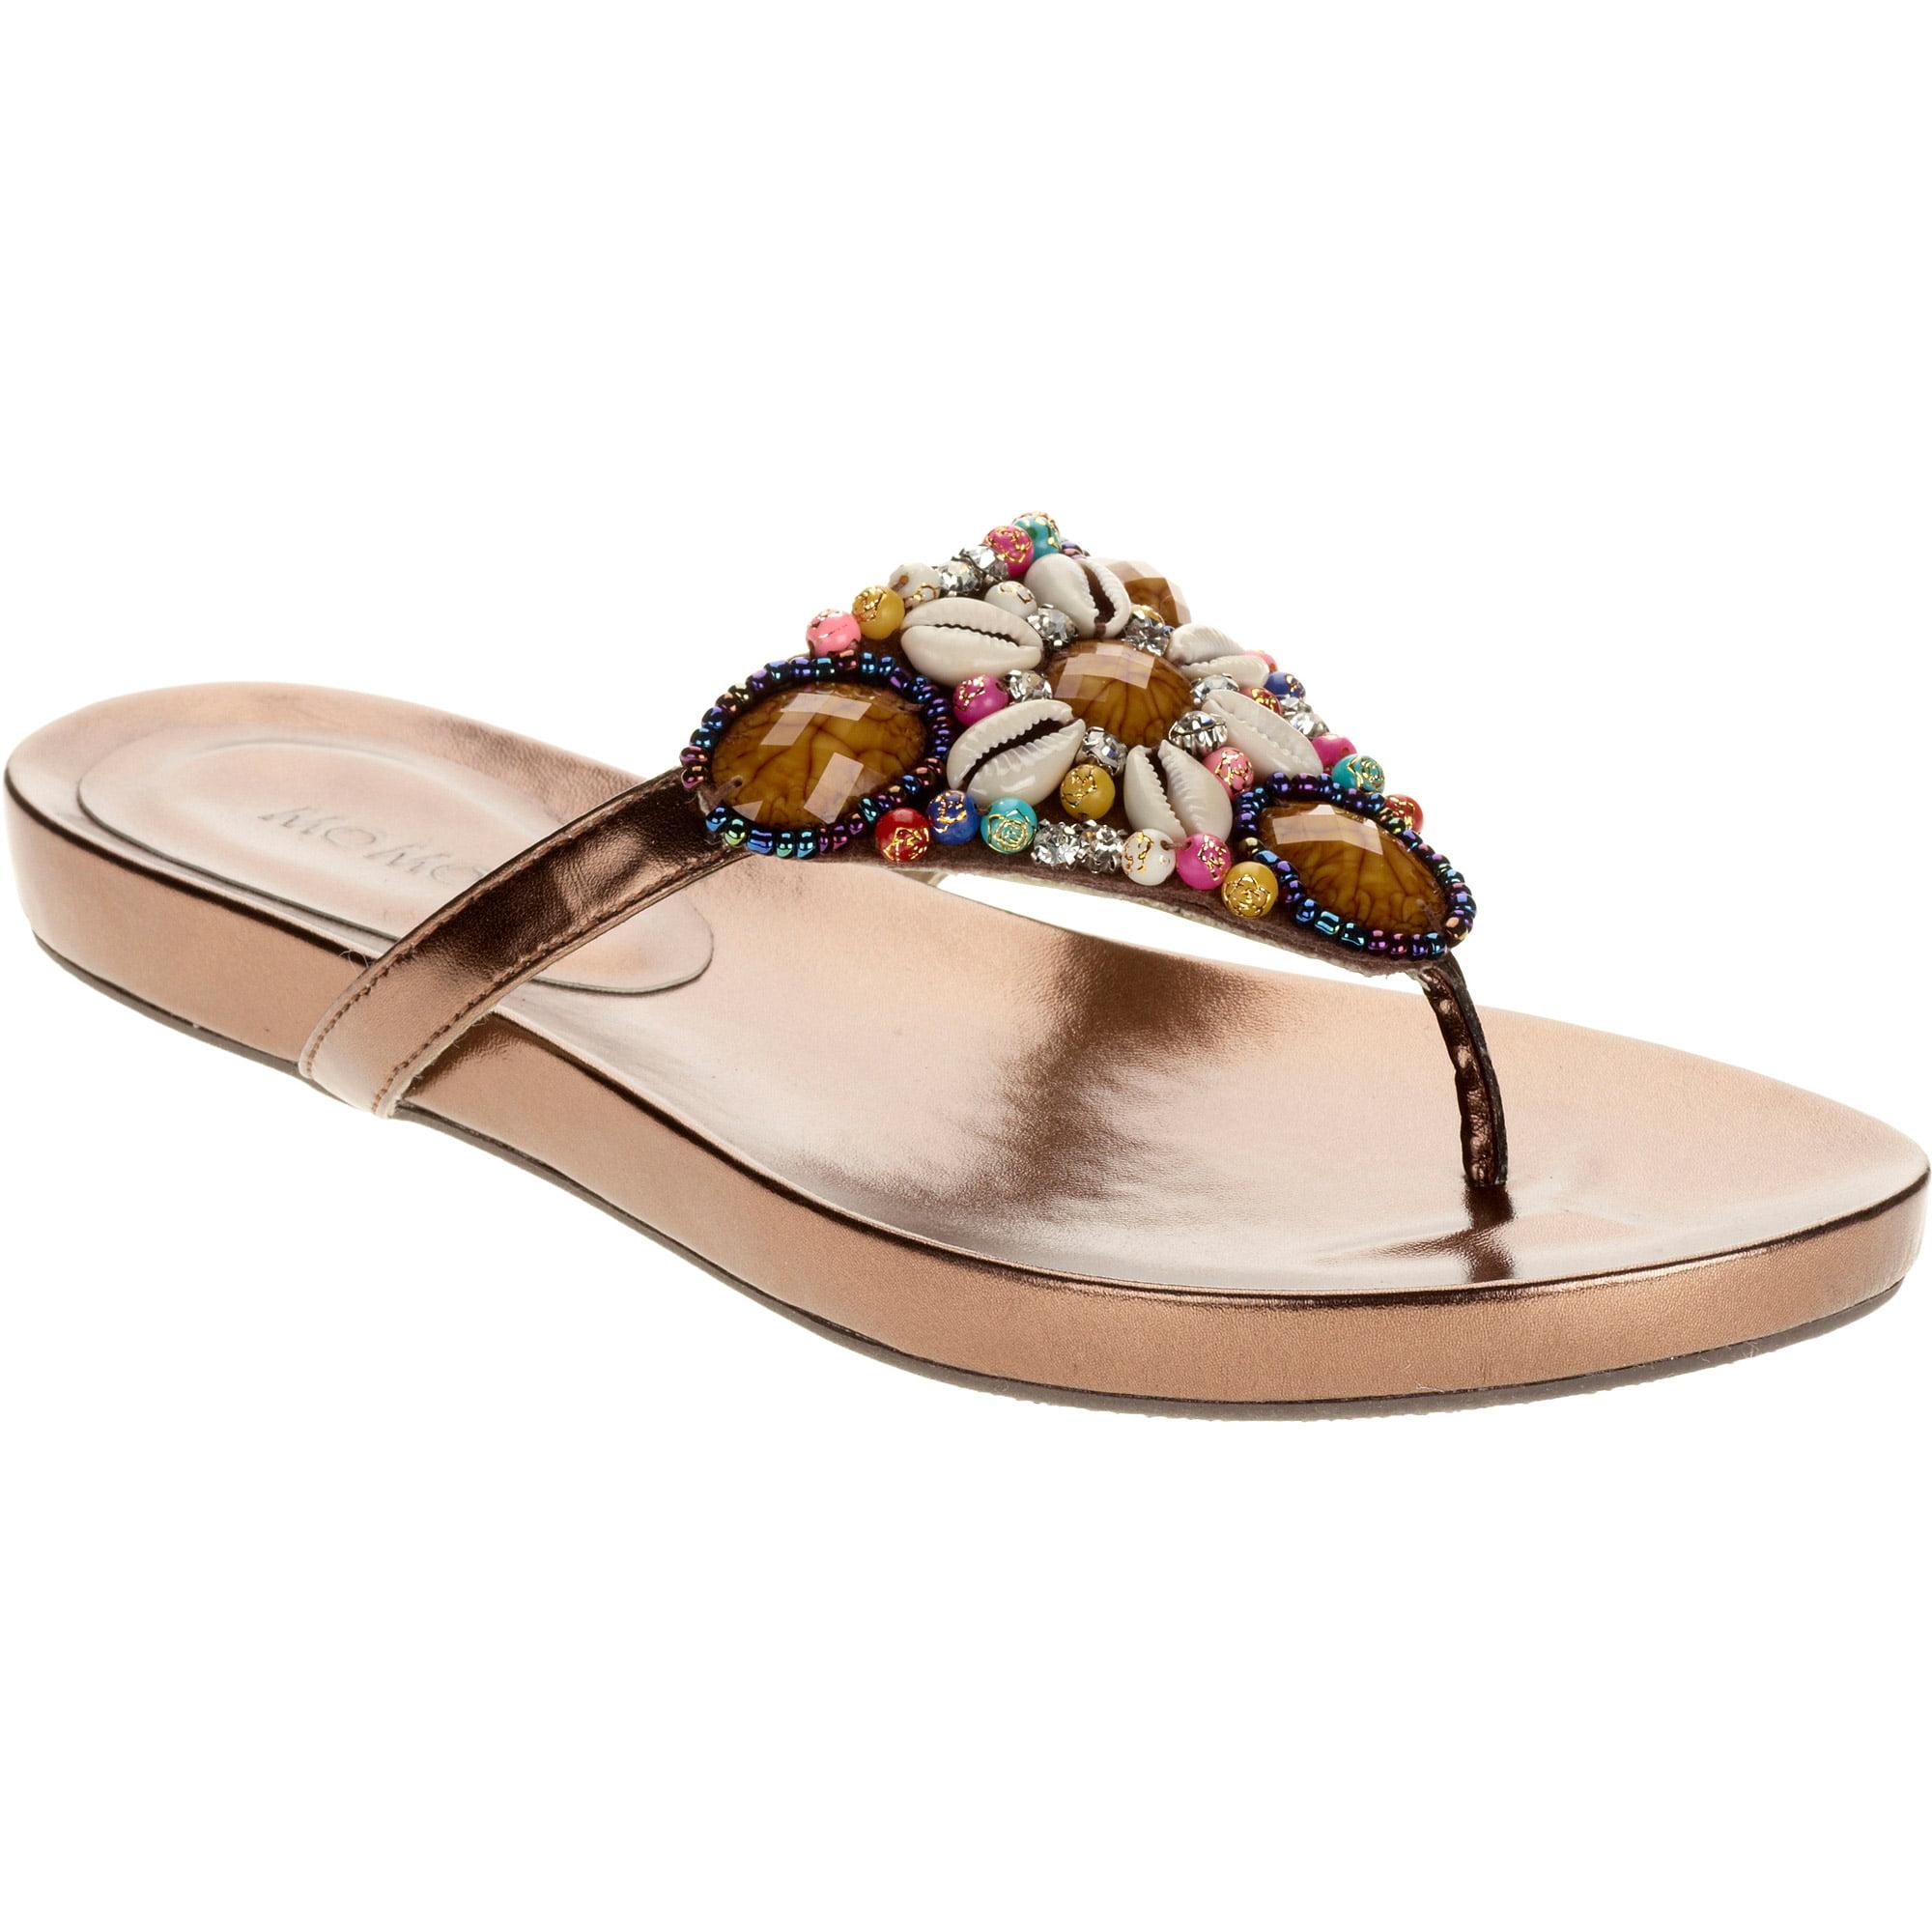 Mo Mo Women's Sunburst Embellished Comfortable Footbed Bottom Thong Sandal